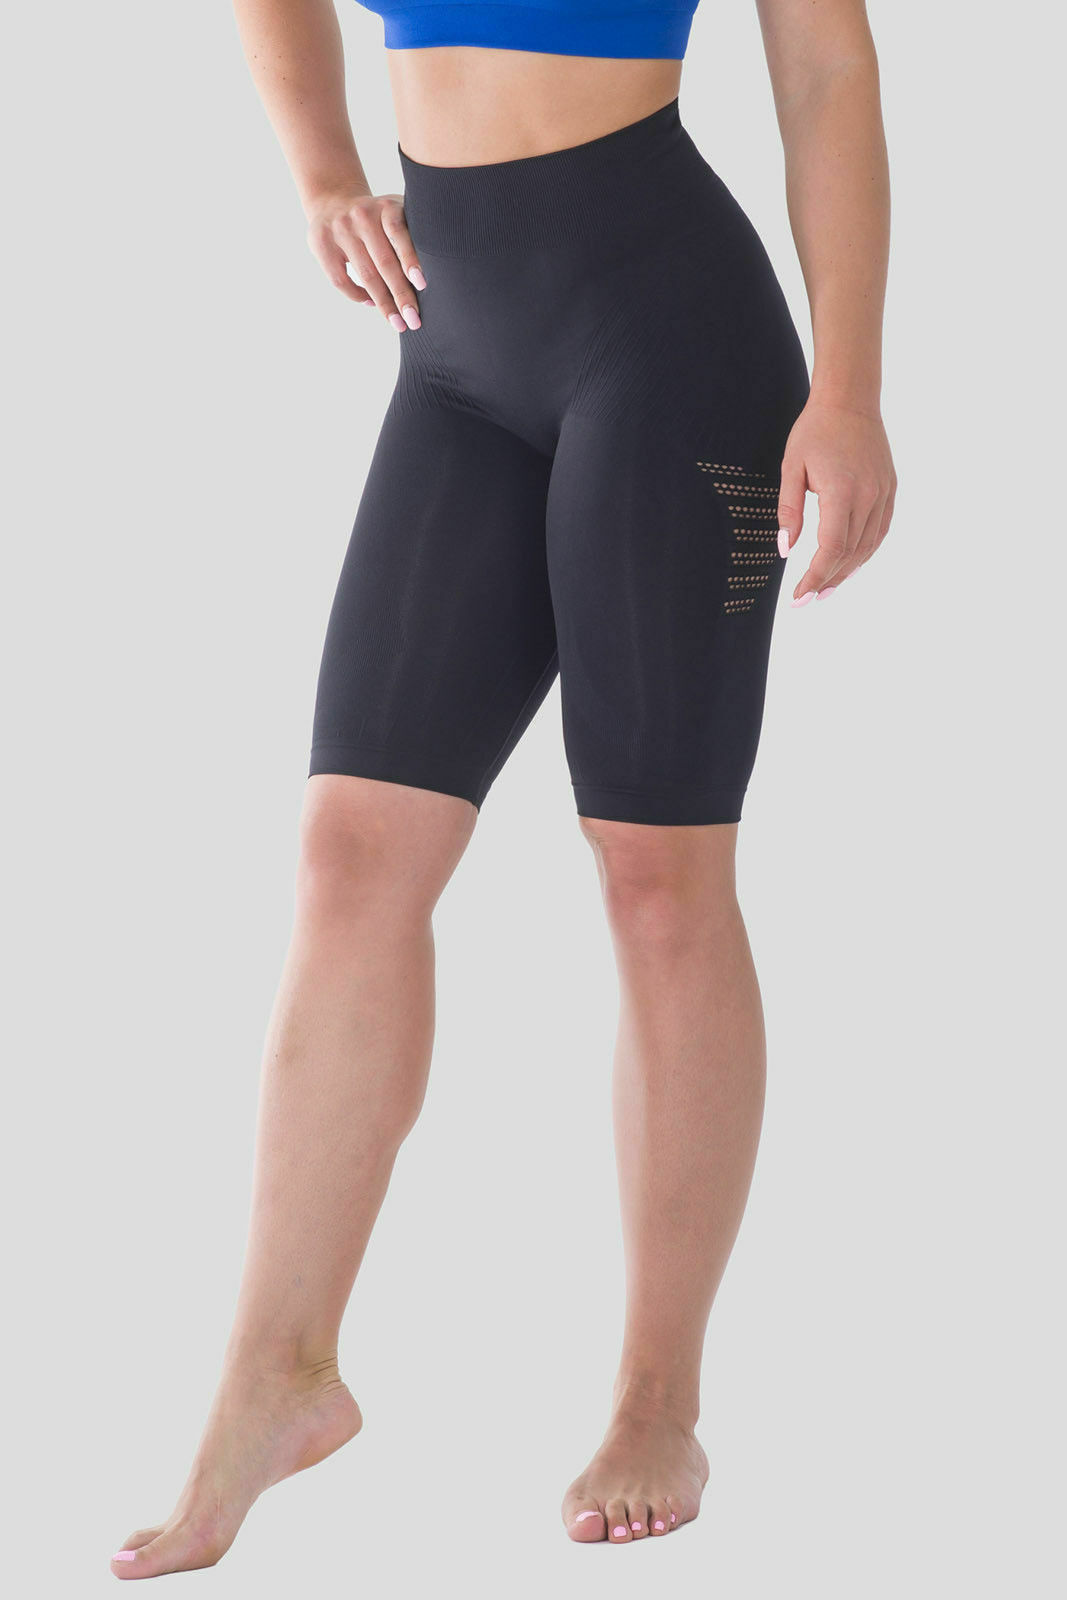 Bellissima-Women-039-s-Compression-Sport-Yoga-Shorts-High-Waist-Workout-Running thumbnail 16